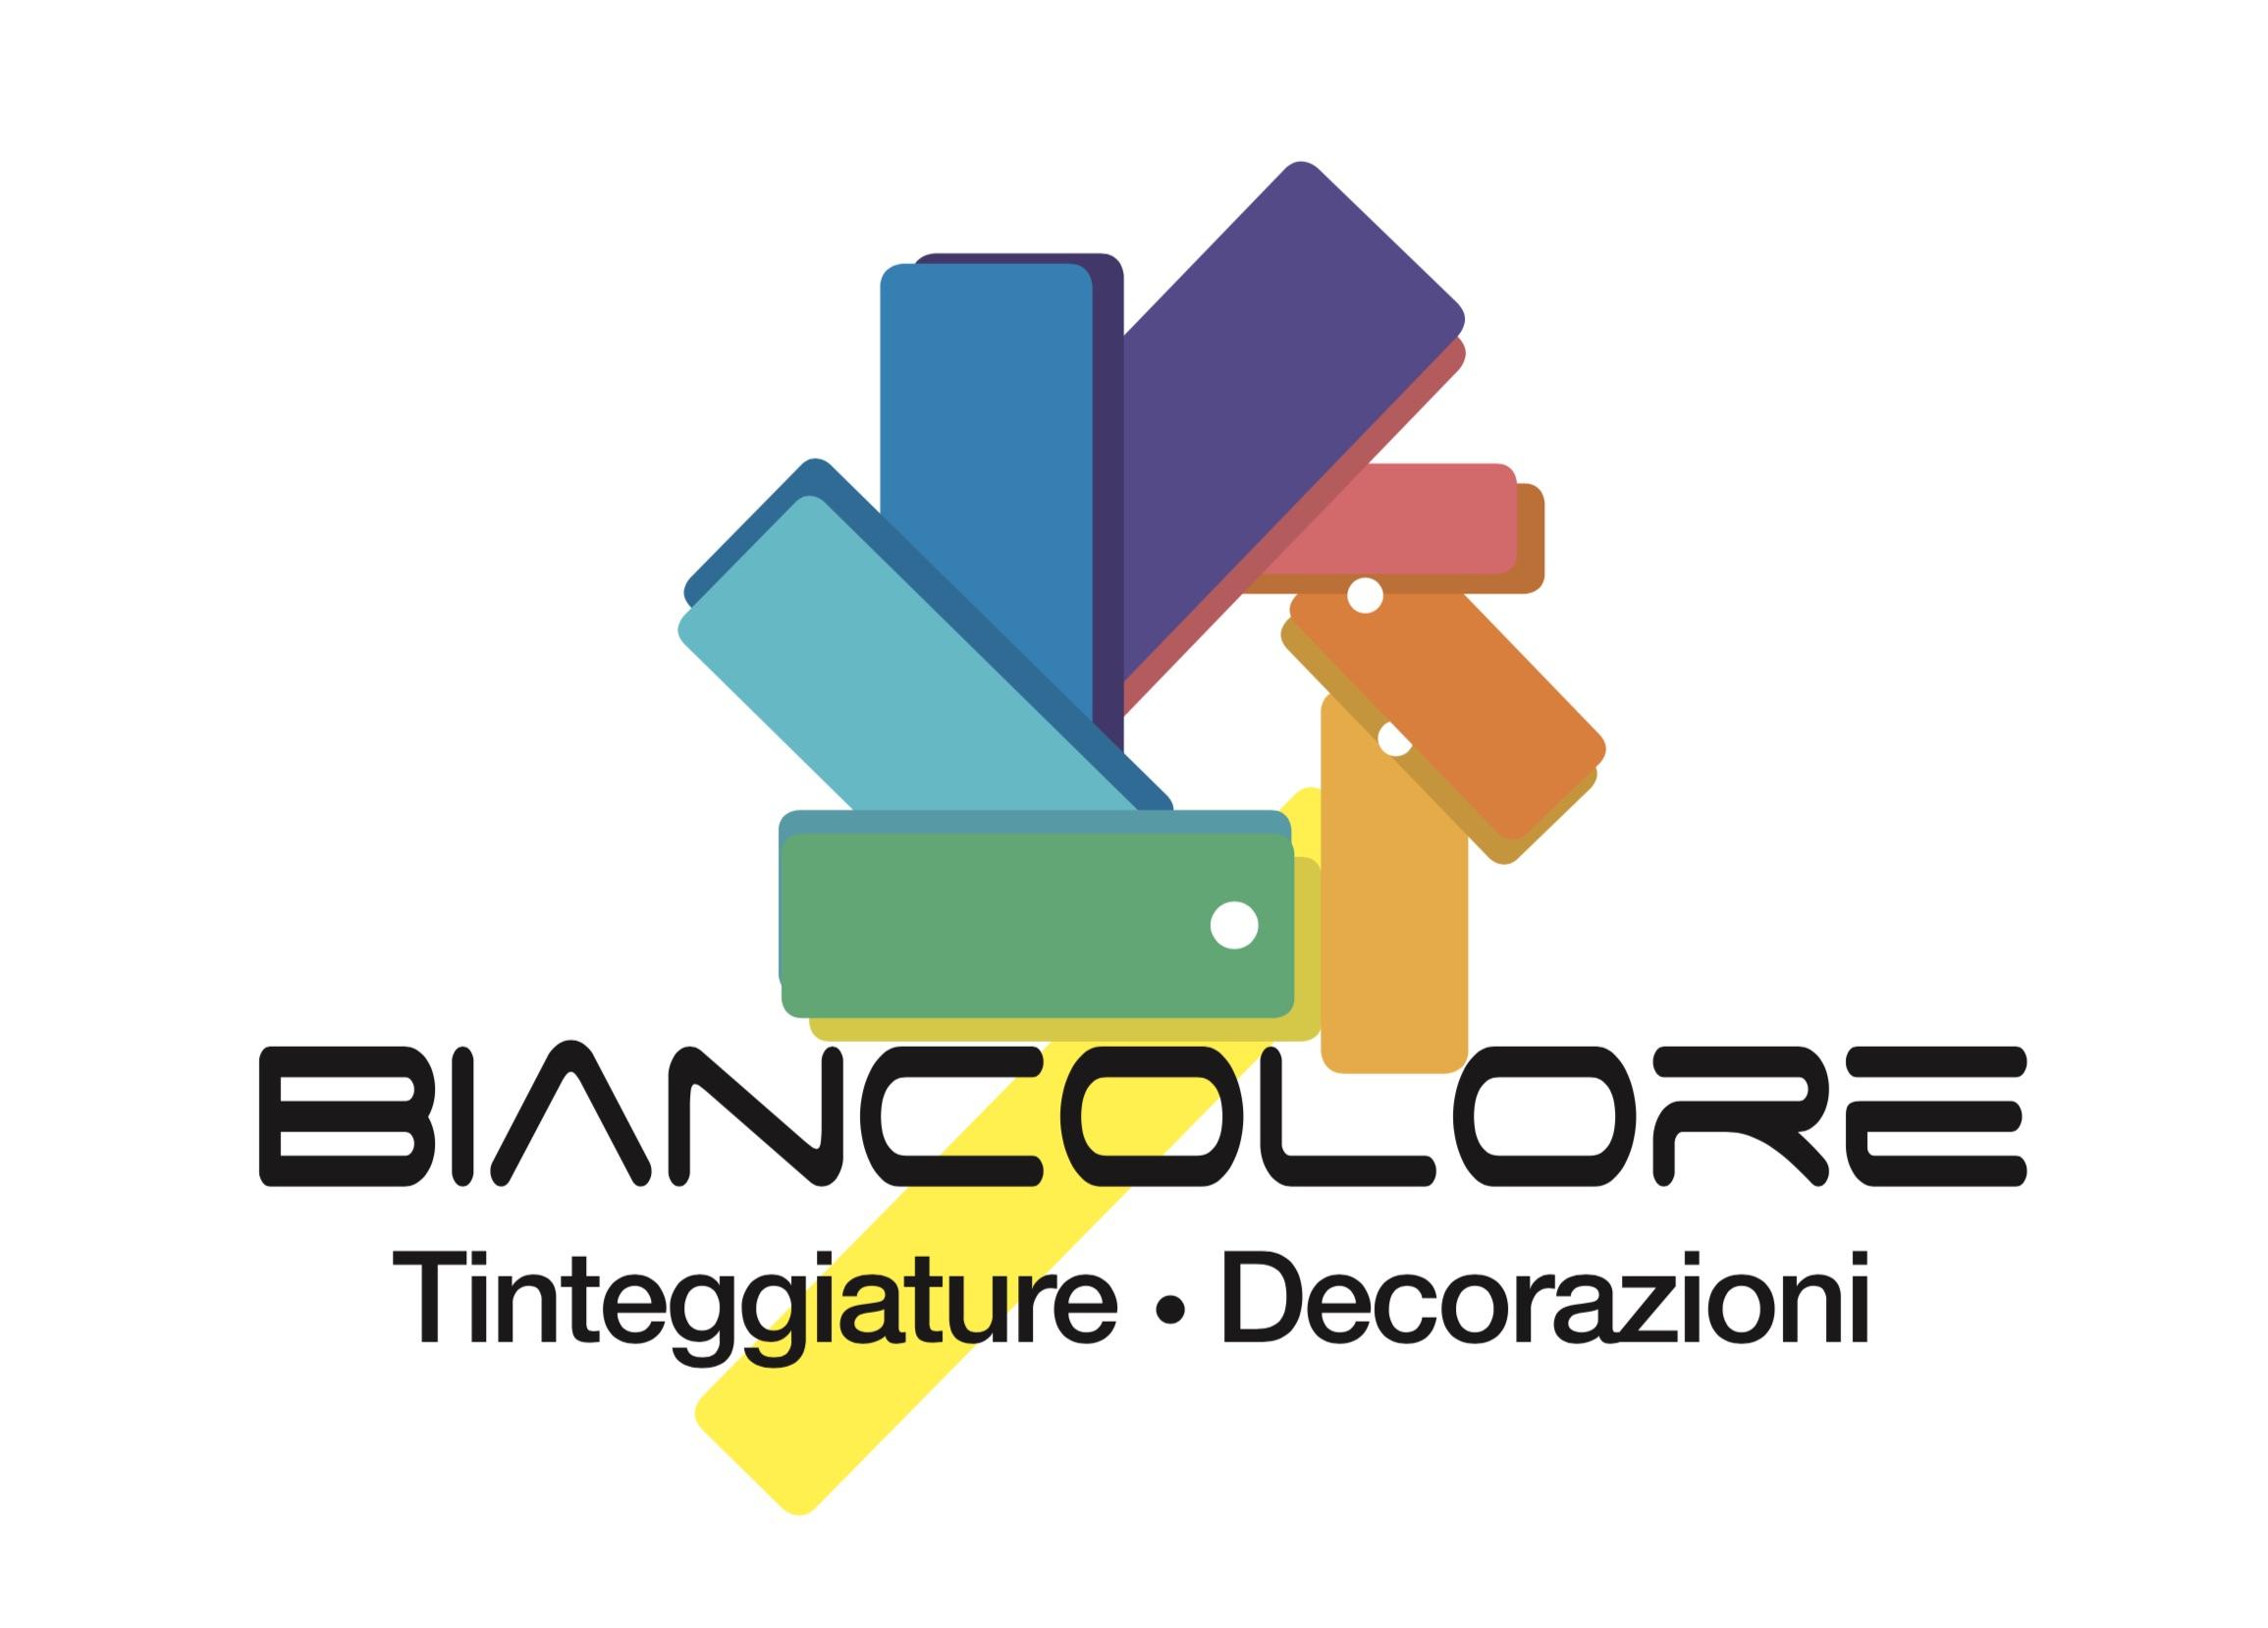 BIANCOLORE TINTEGGIATURE DI GIANNUZZI MICHELE